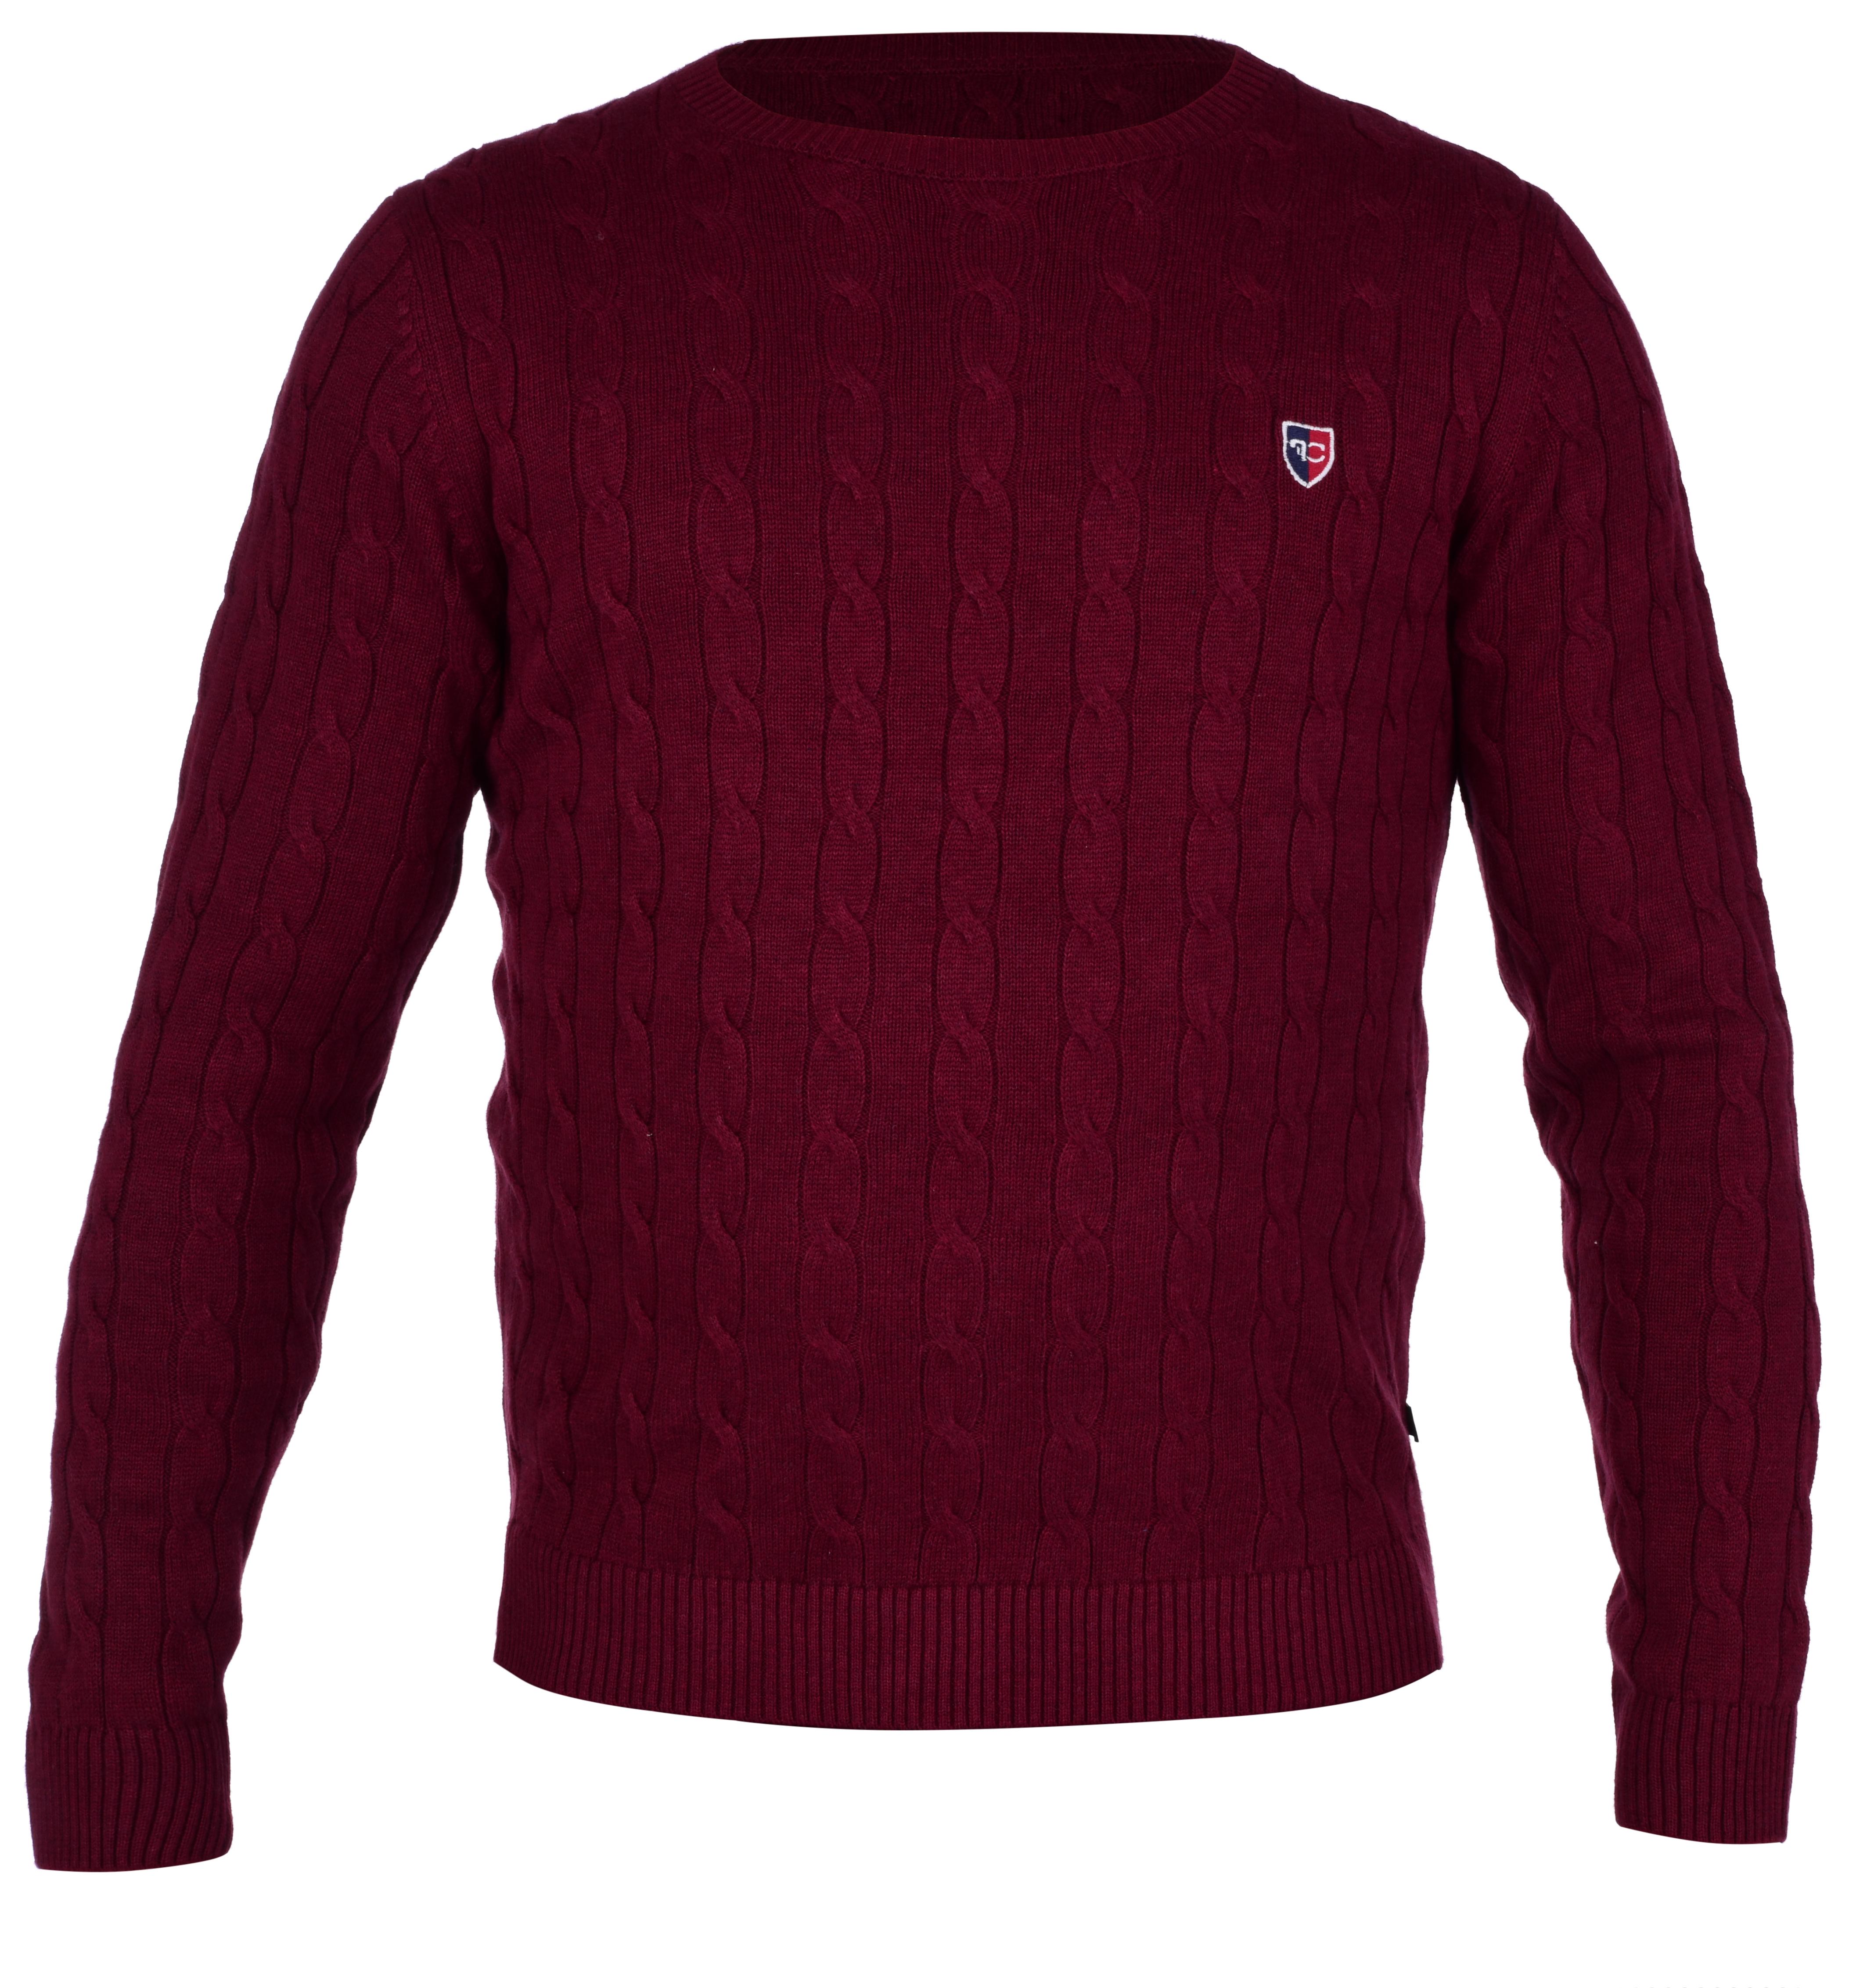 Pánský bavlněný svetr COTTON LÉGER bordó melange   3(XL)